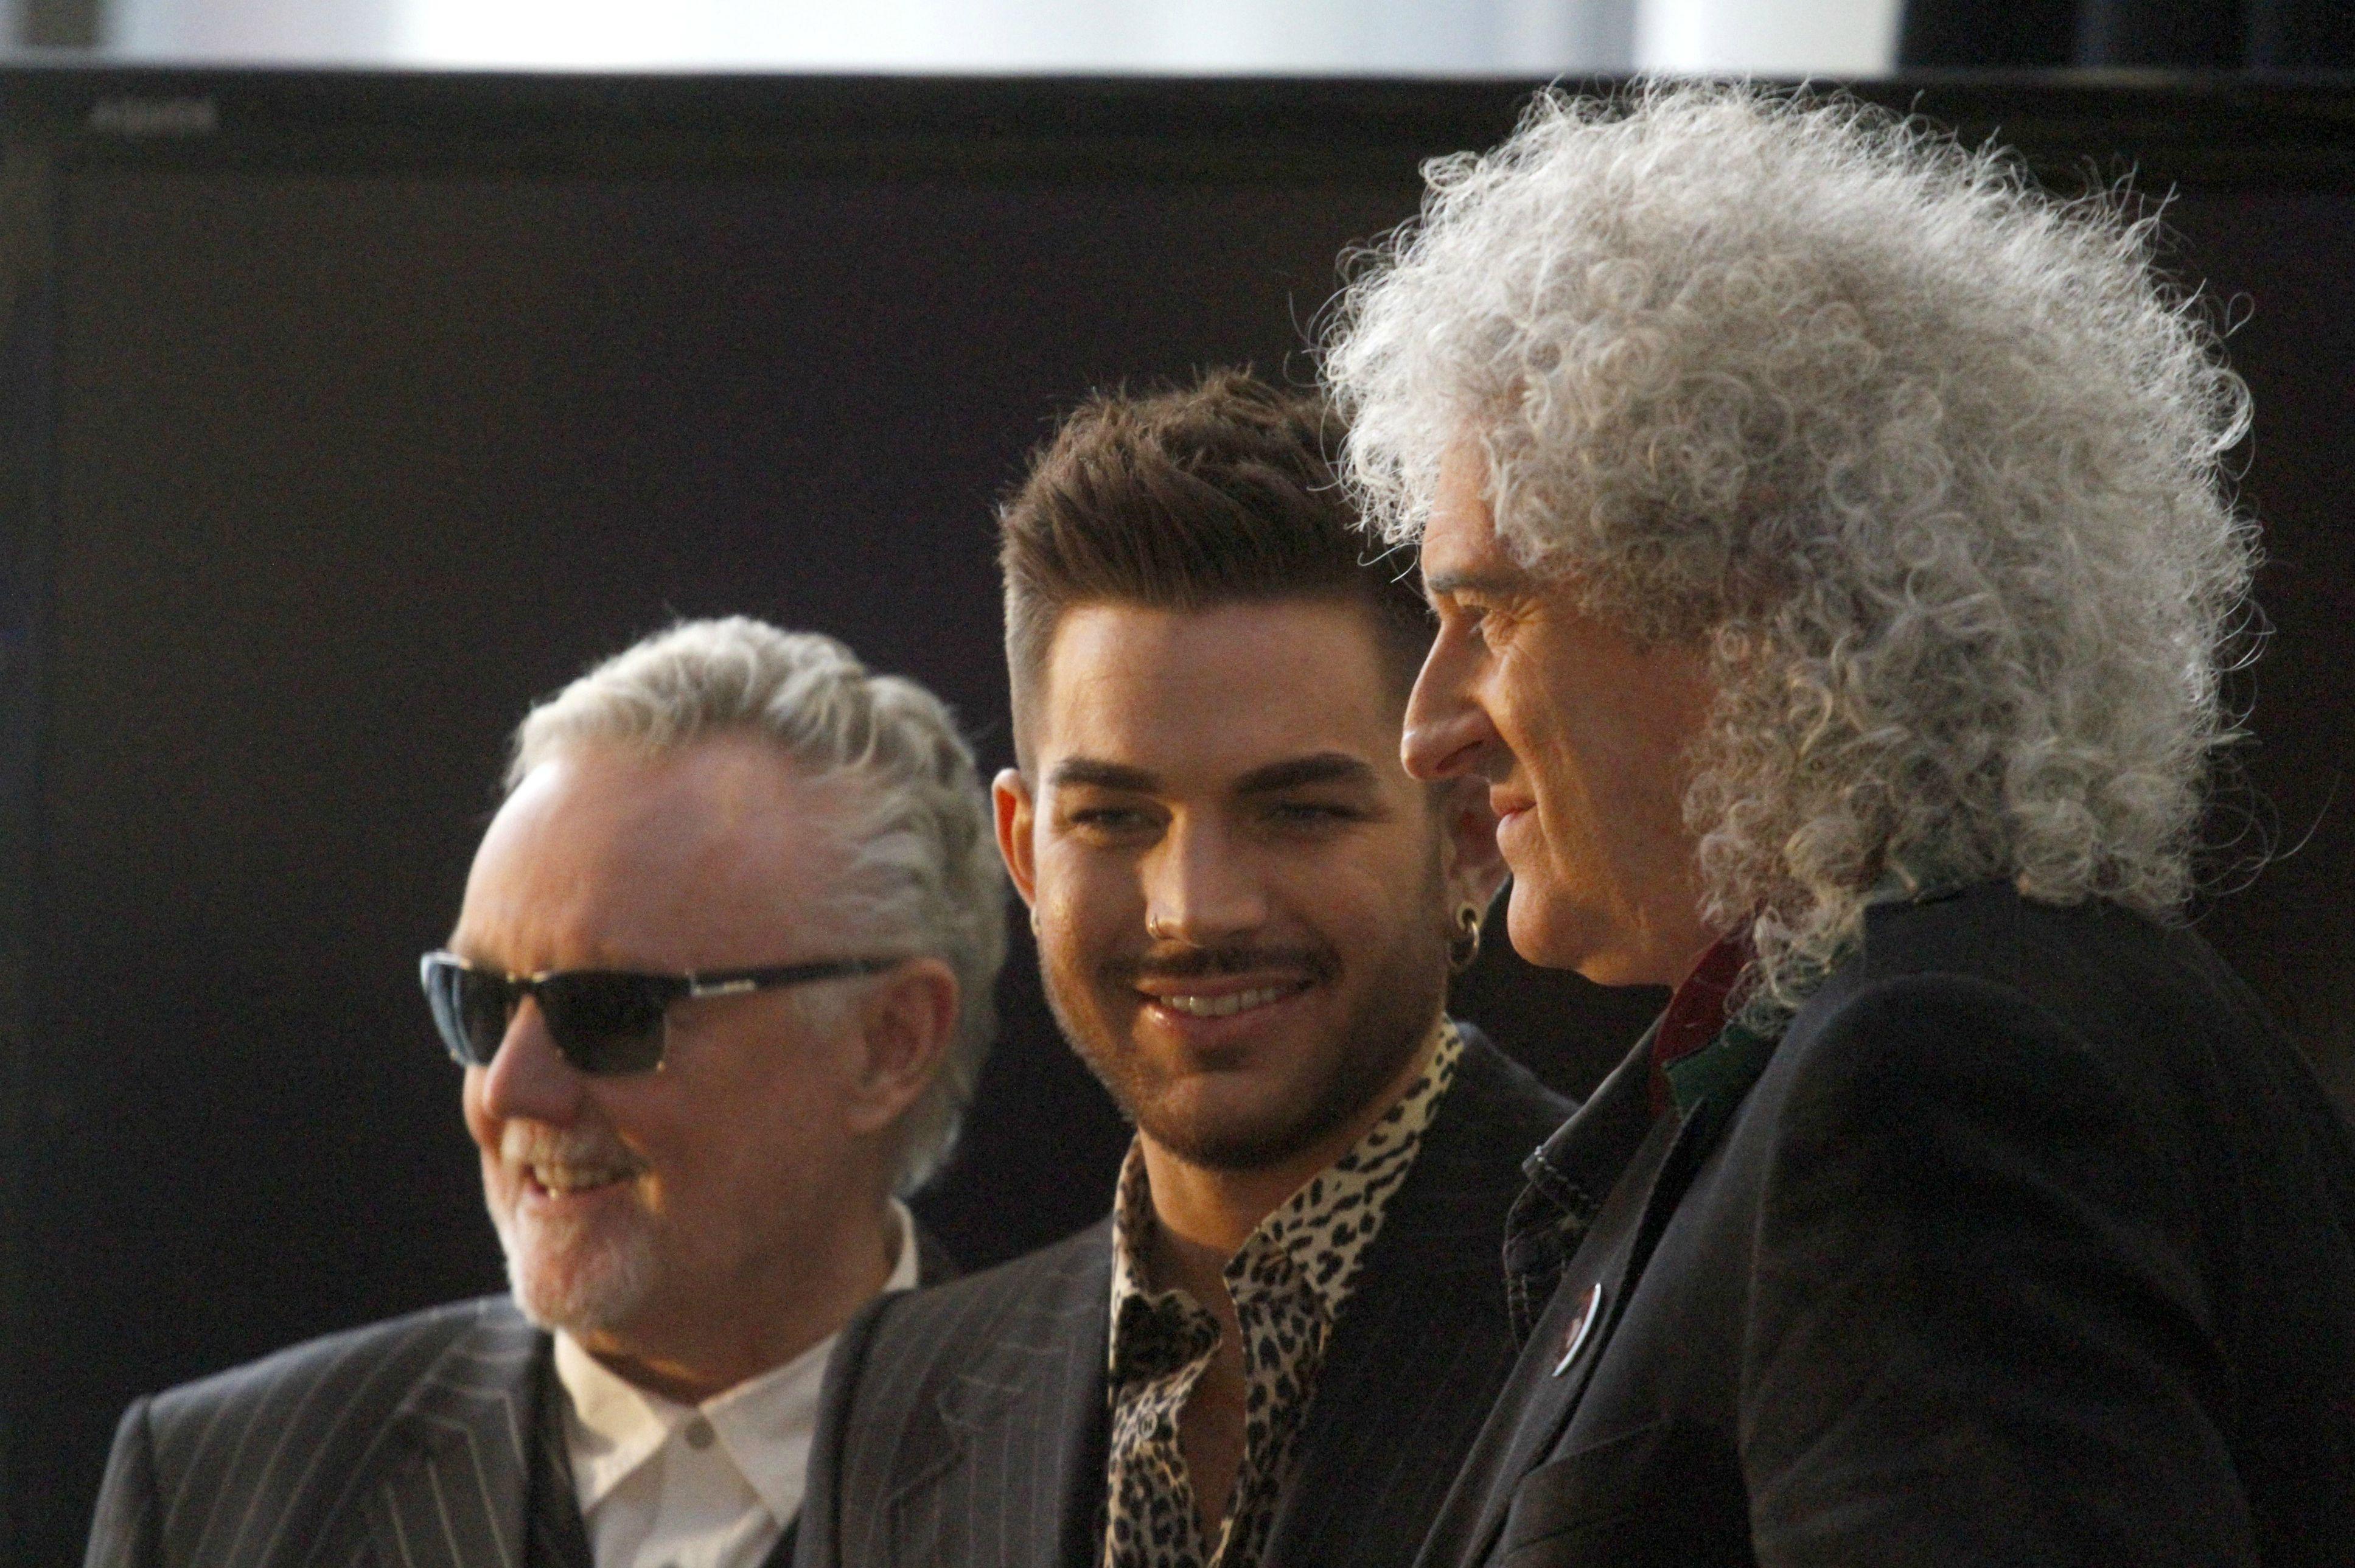 03 06 14 Queen Adam Lambert 2014 North American Tour